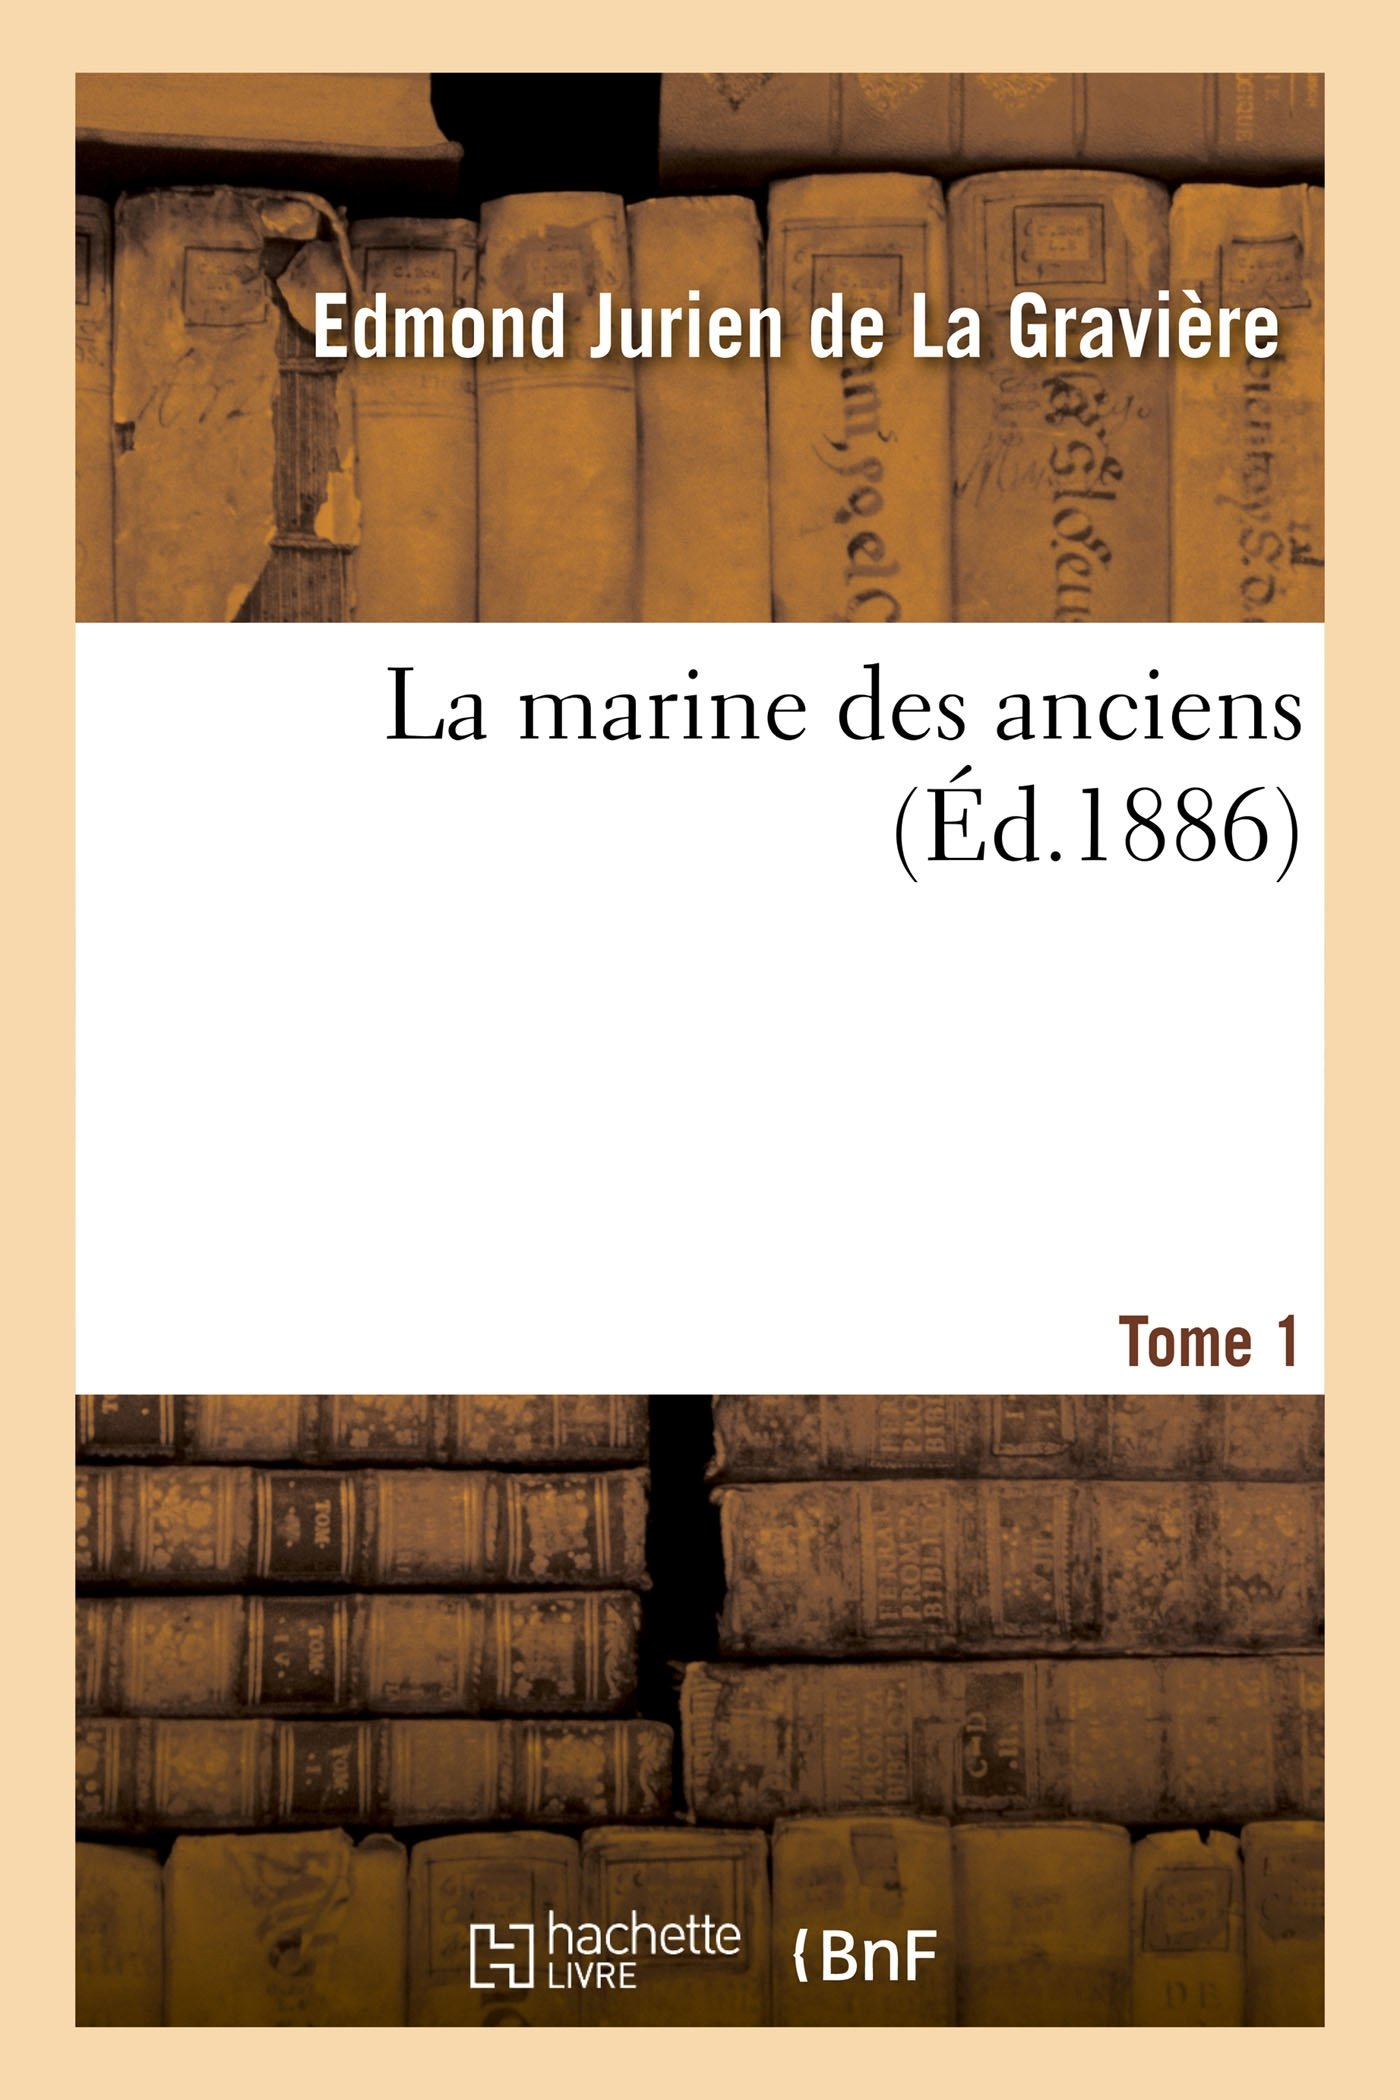 Download La Marine Des Anciens T01 (Histoire) (French Edition) ebook